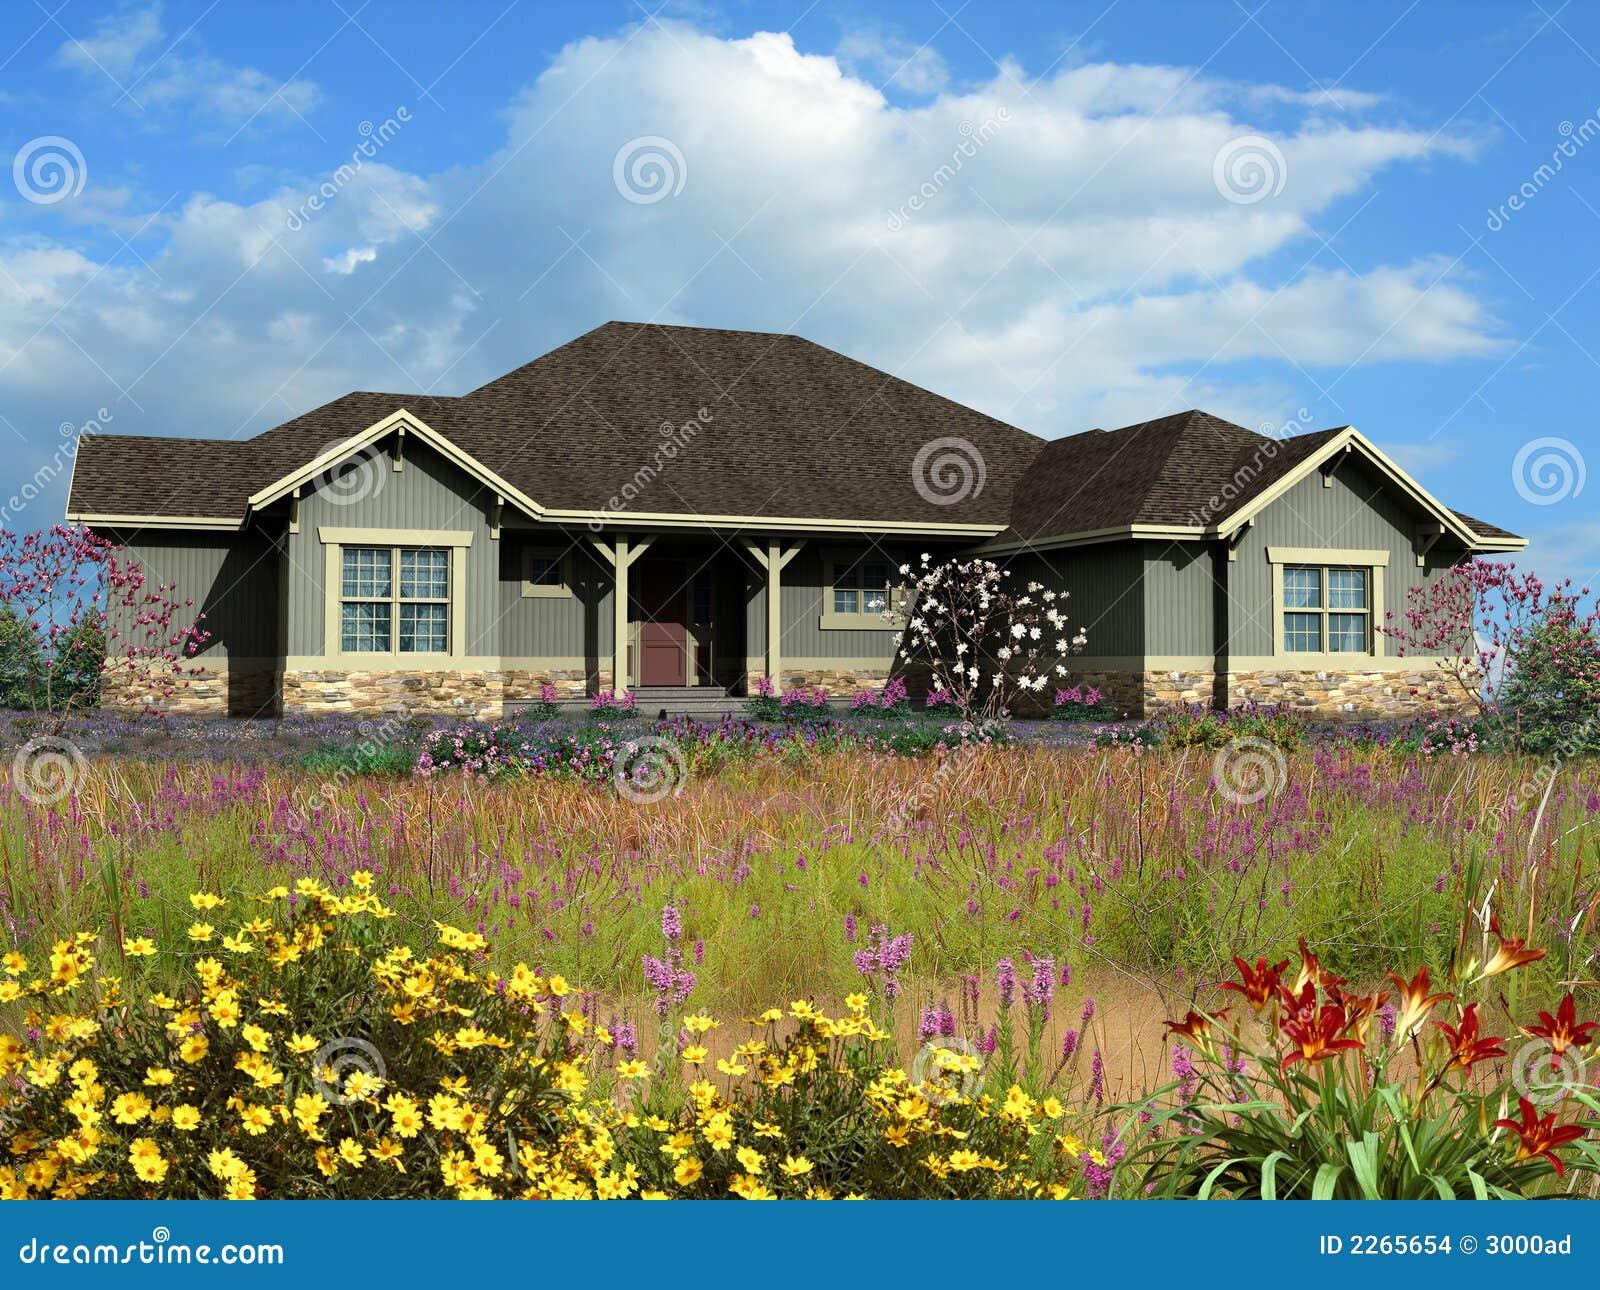 Modelo 3d de la casa de rancho foto de archivo imagen for Modelo de casa de 4x6